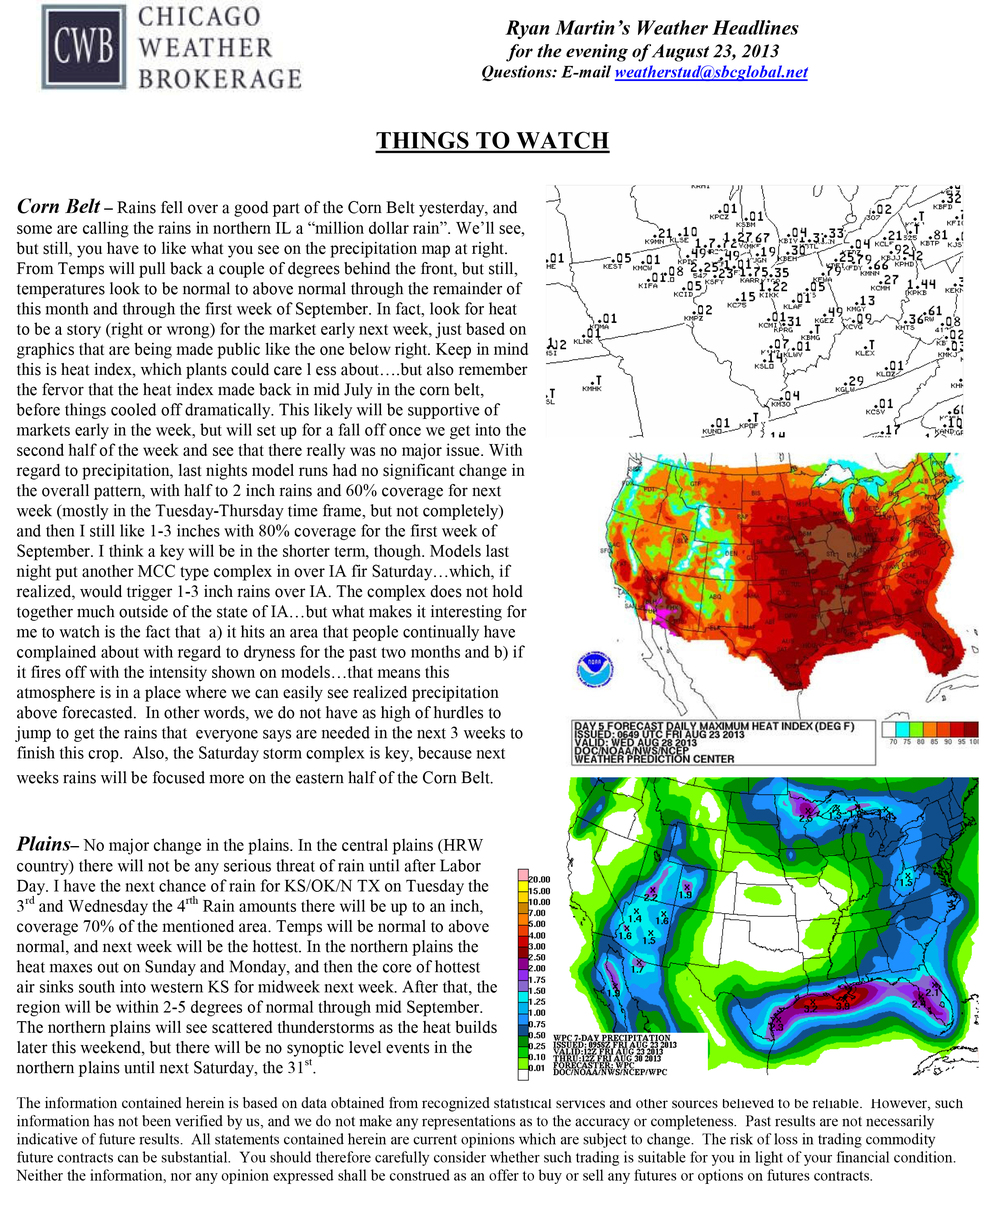 CWB PM weather headlines 8-23-13.jpg